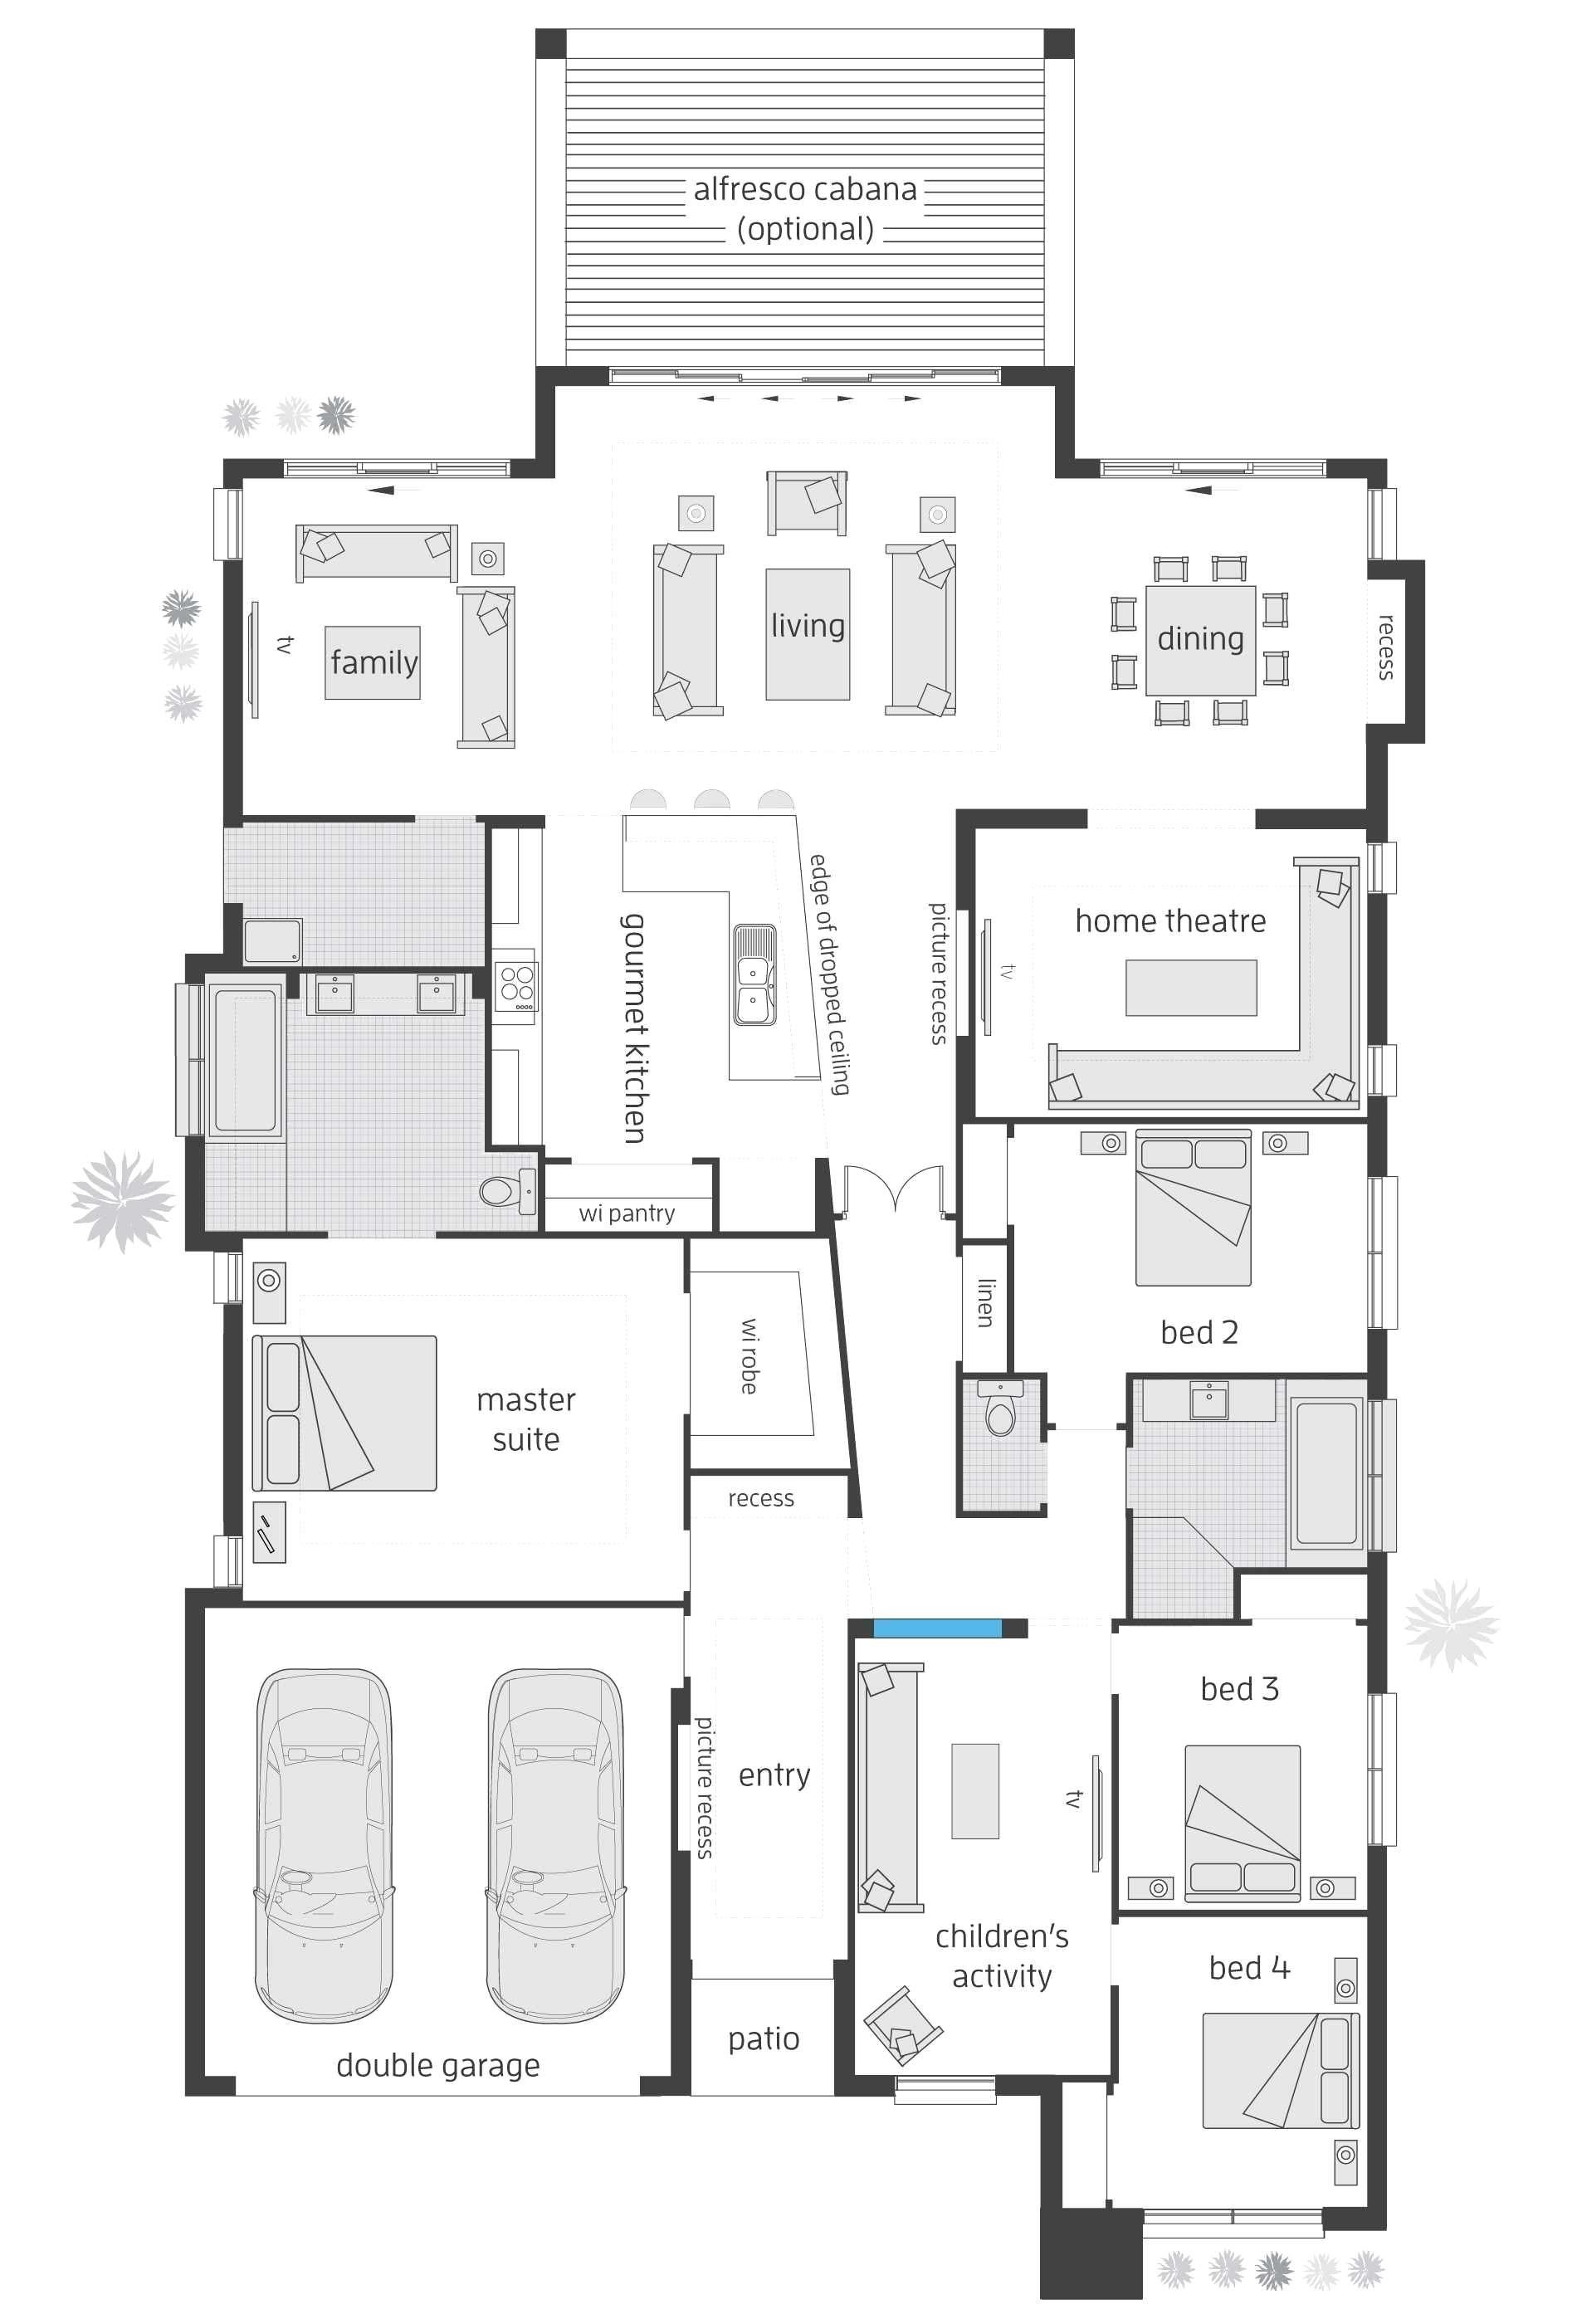 30a 50 house plans fresh 30a 50 house plans luxury shotgun houses 30